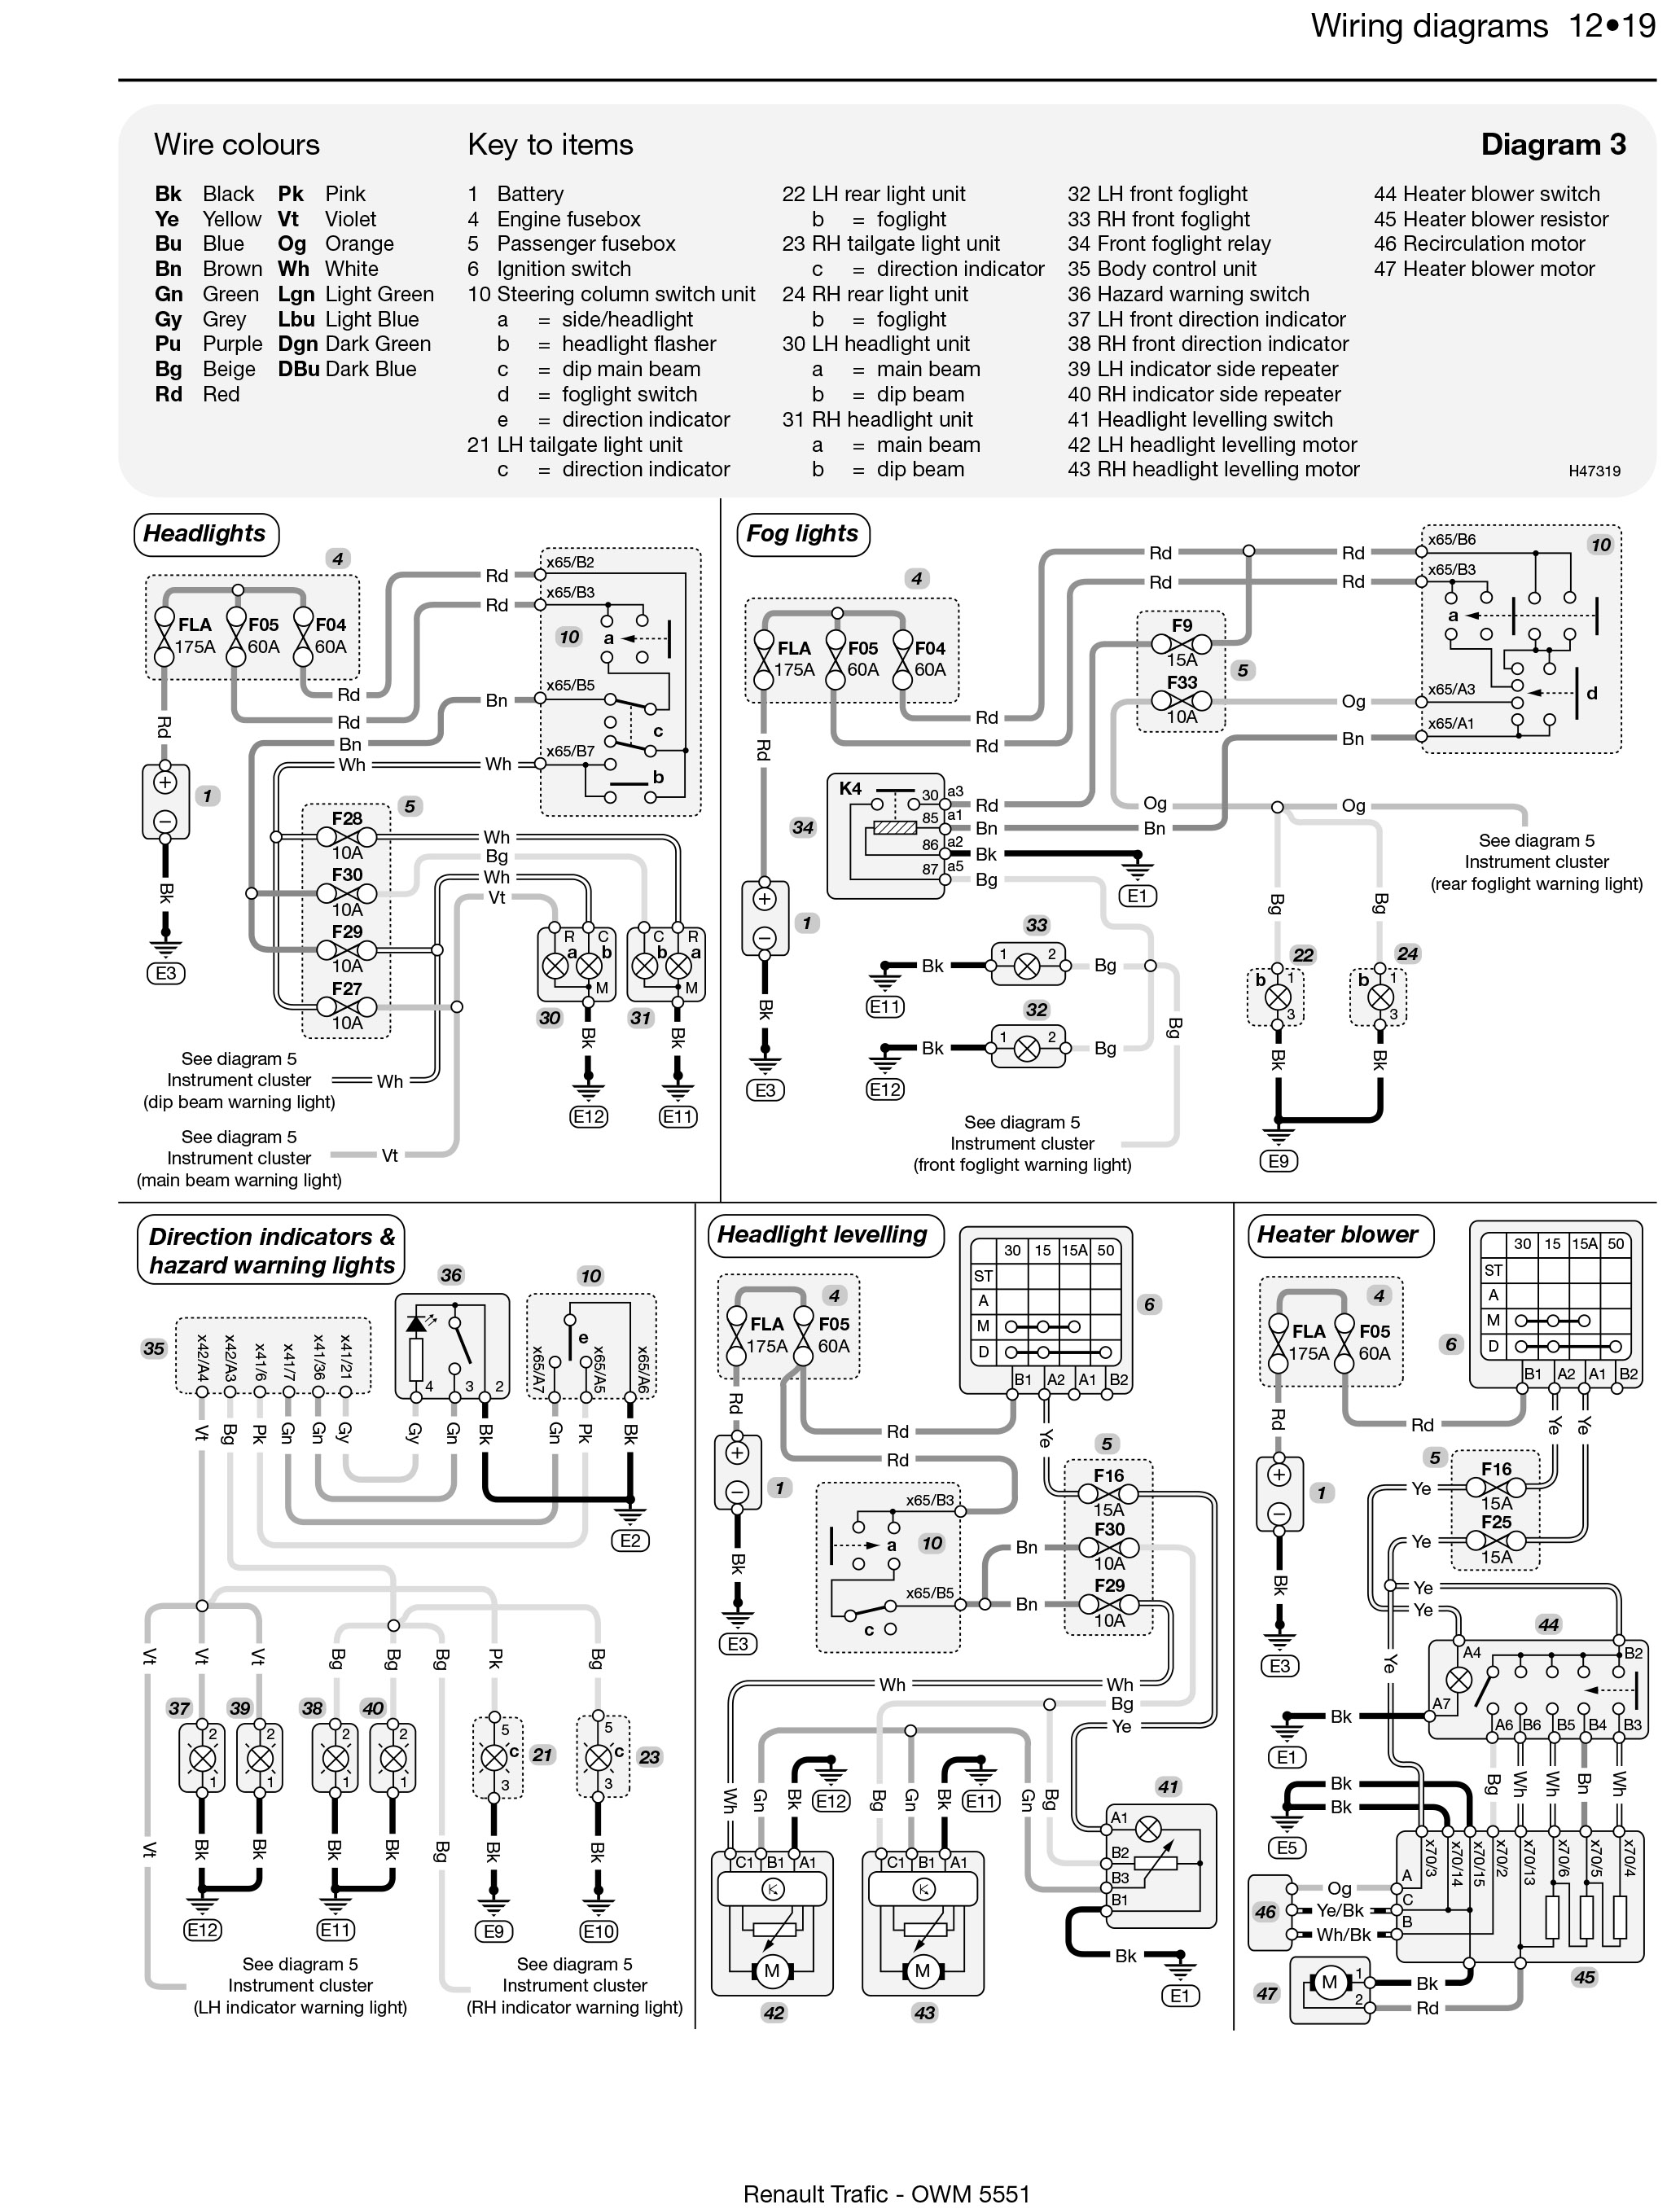 diagram] renault master 2 wiring diagram full version hd quality wiring  diagram - usadiagram.sportamort.de  usadiagram.sportamort.de